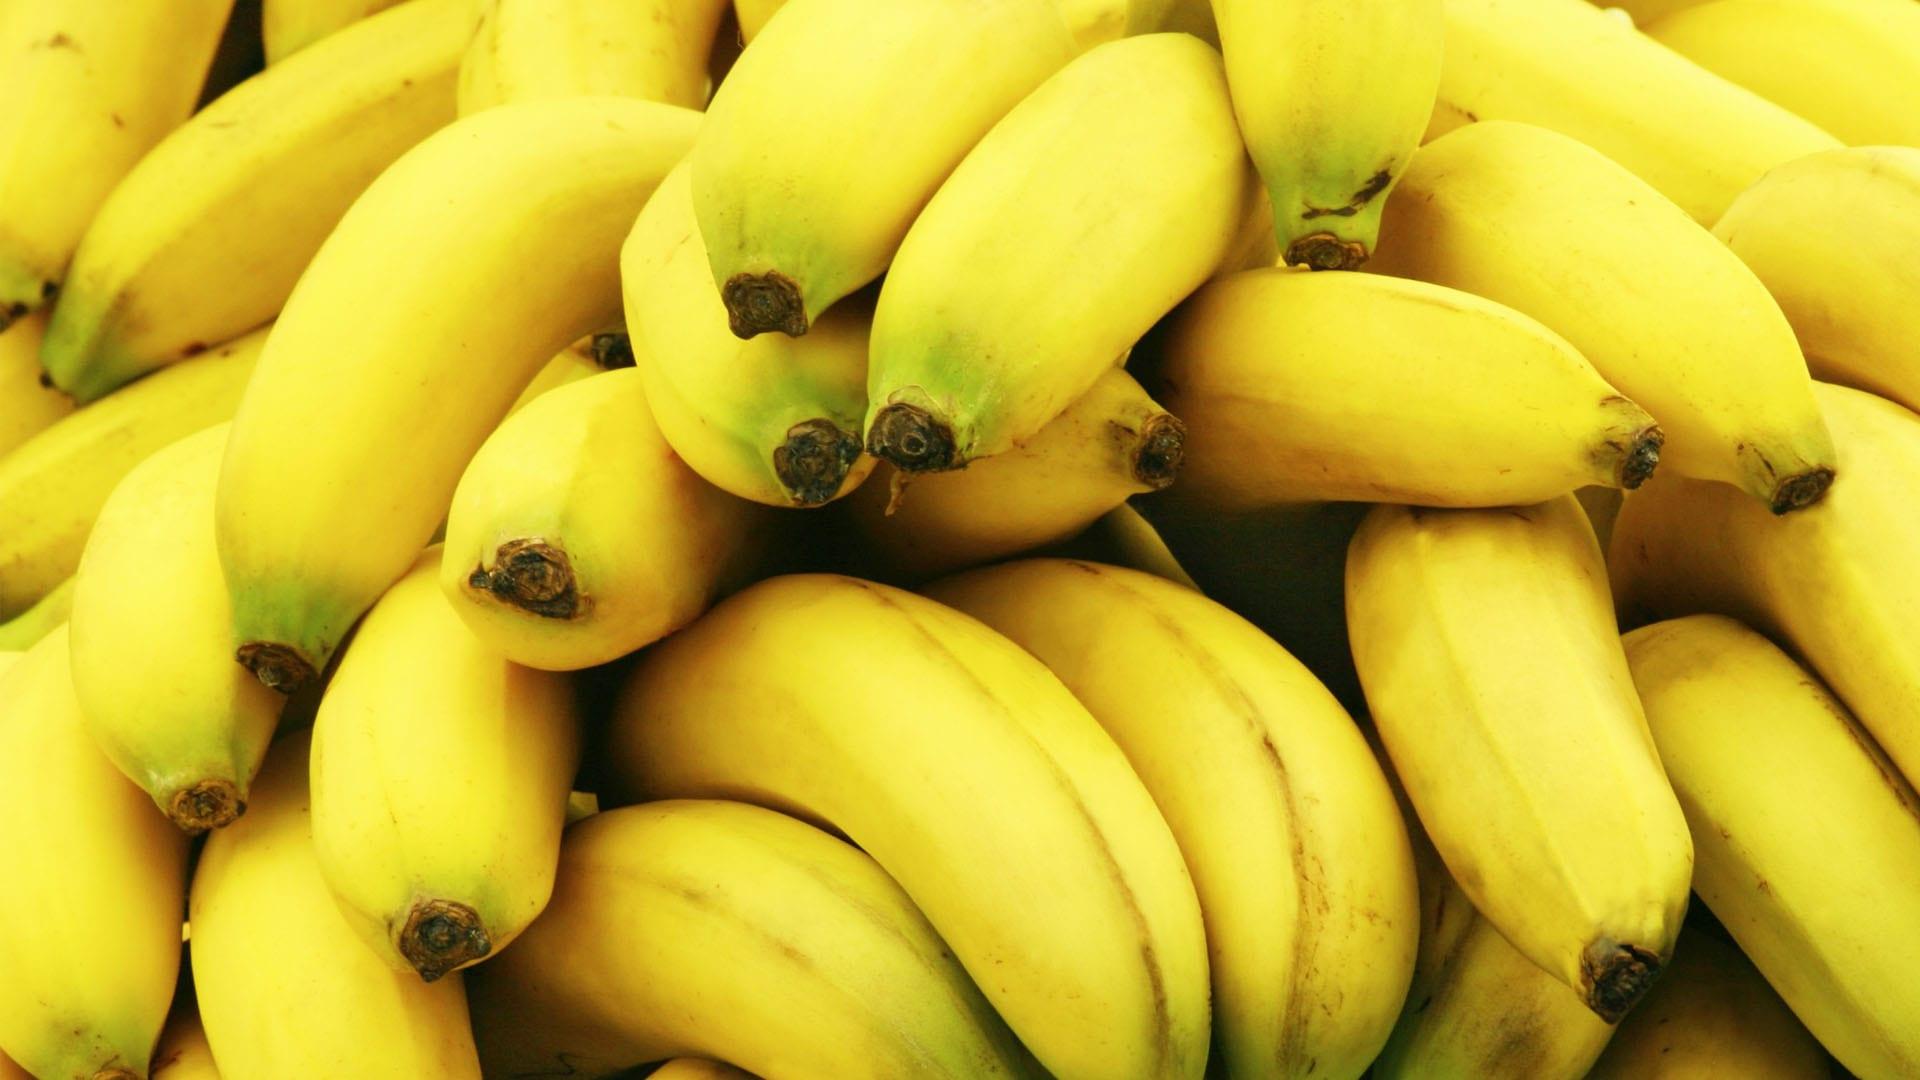 Banana HD pics